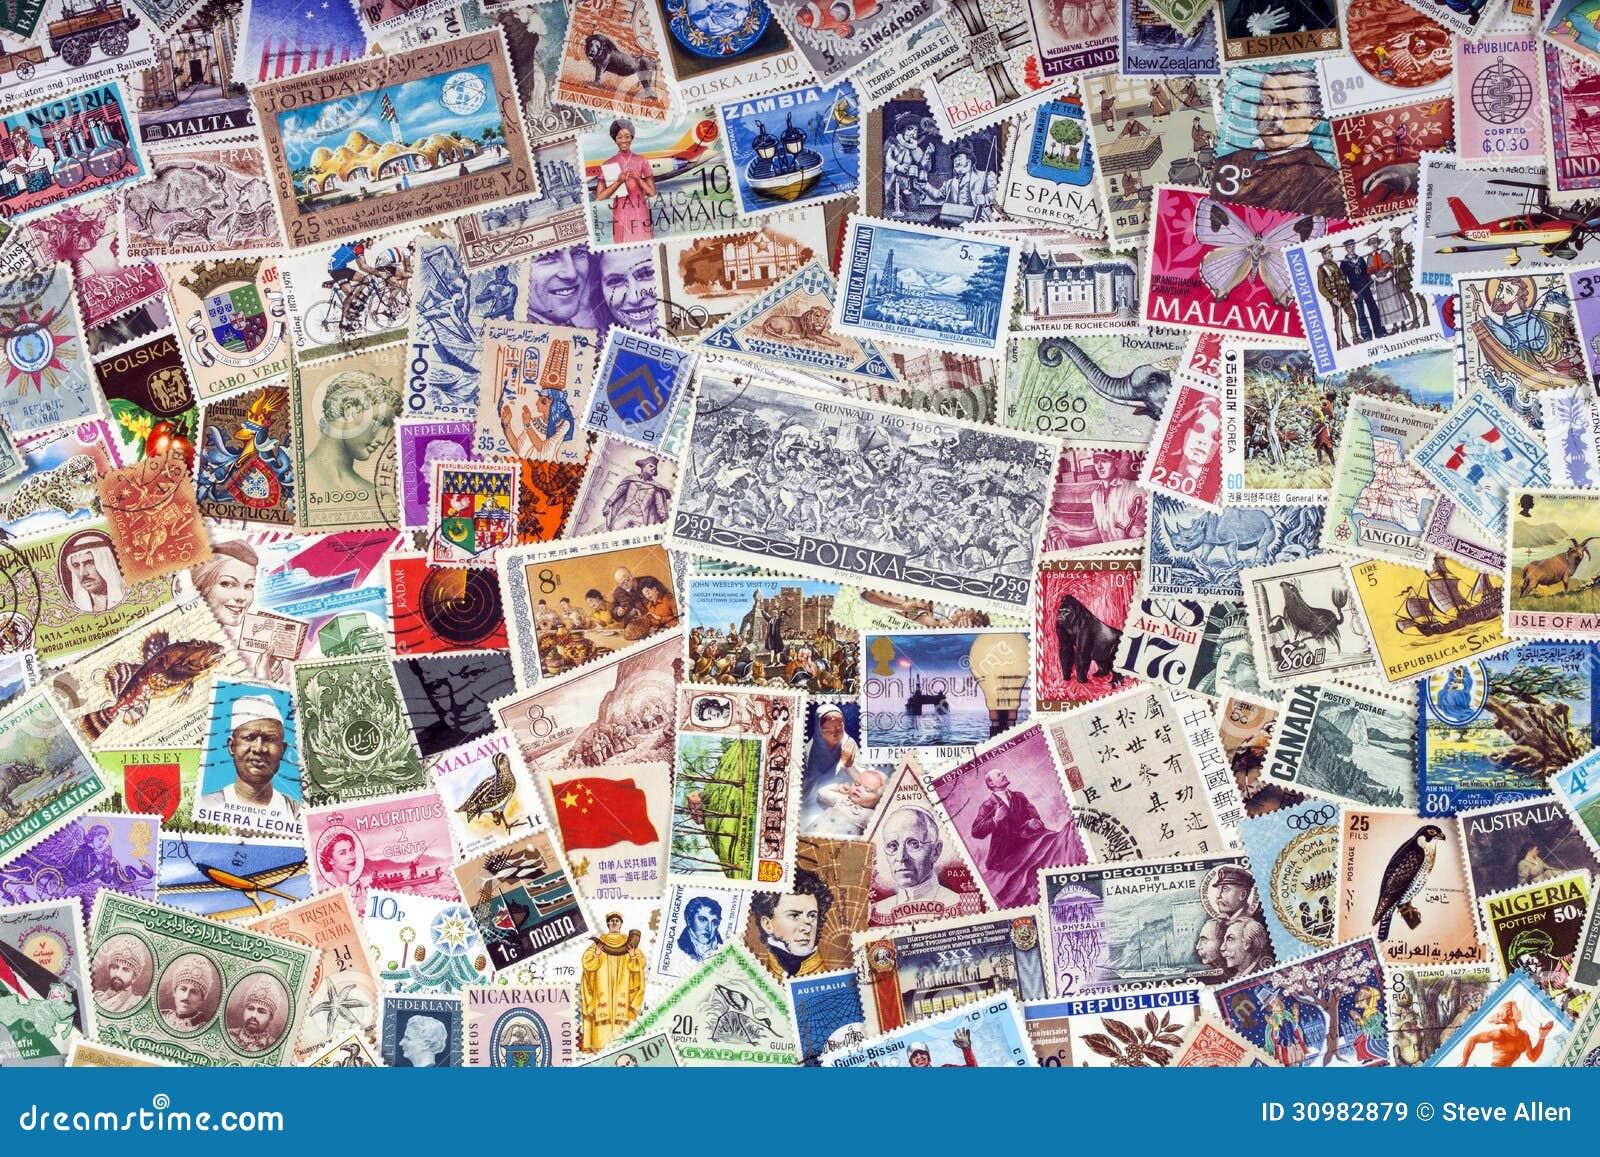 stamp collectors sydney australia time - photo#33